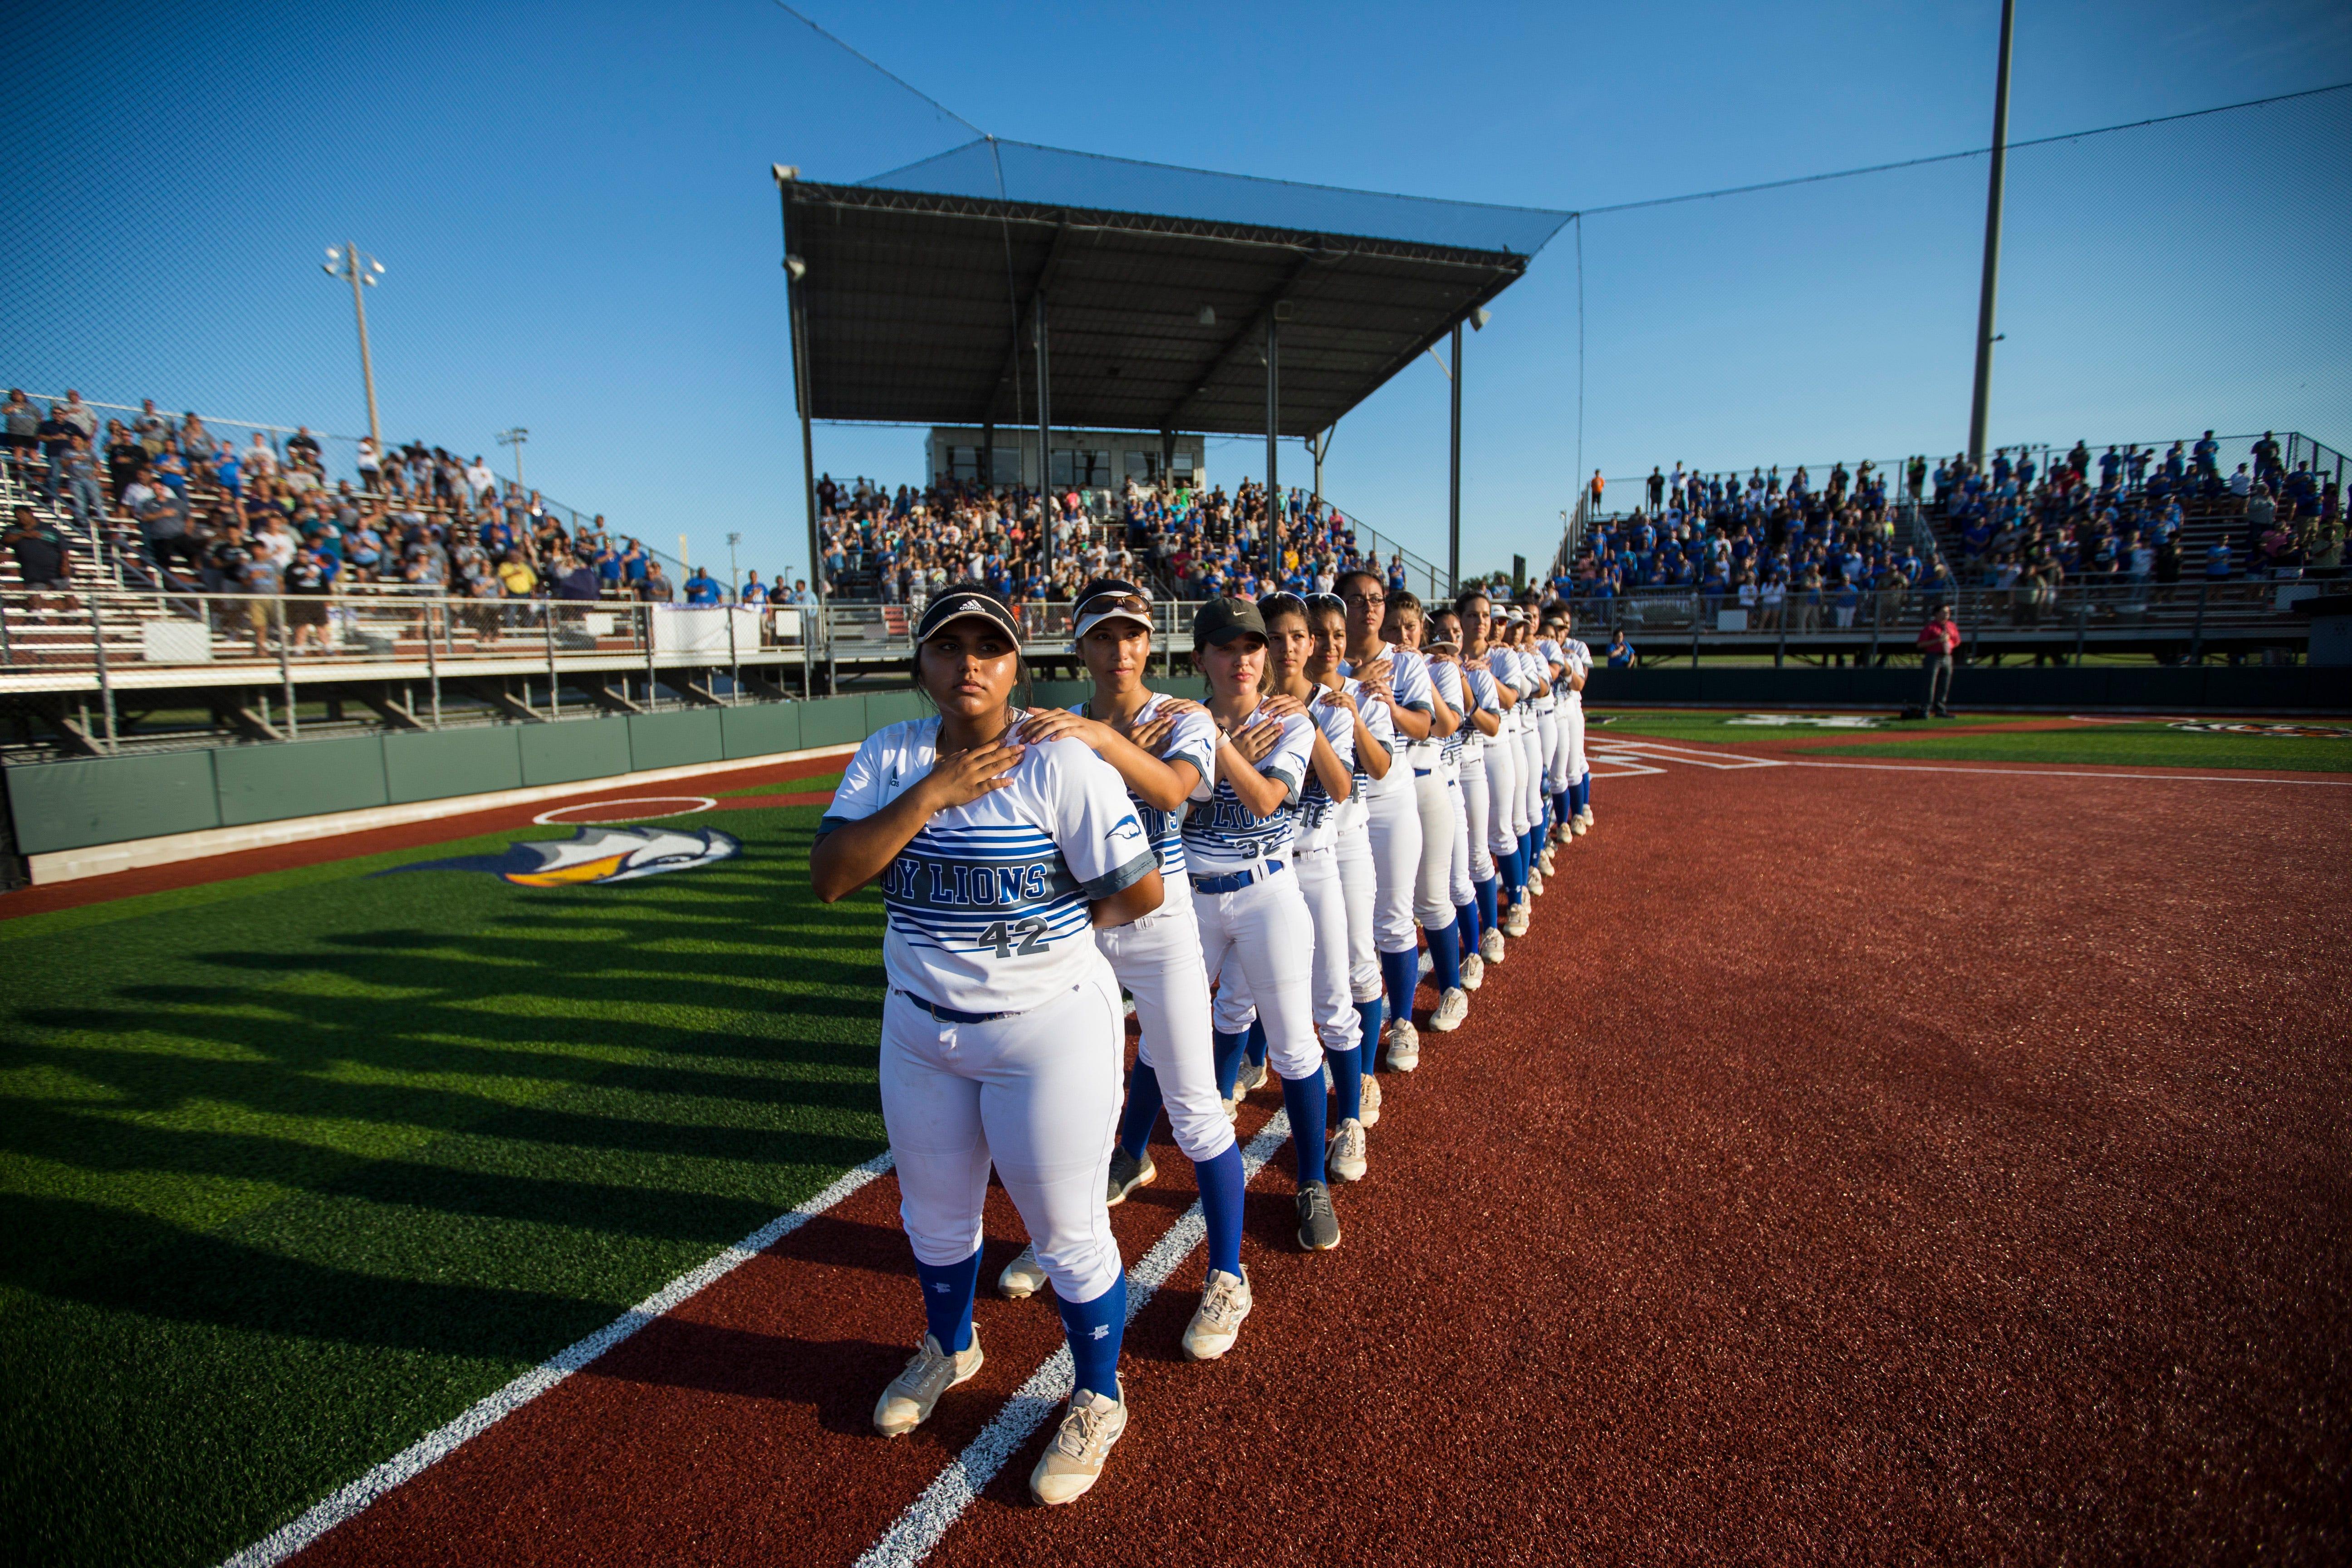 High School baseball, golf, soccer, softball, tennis, track